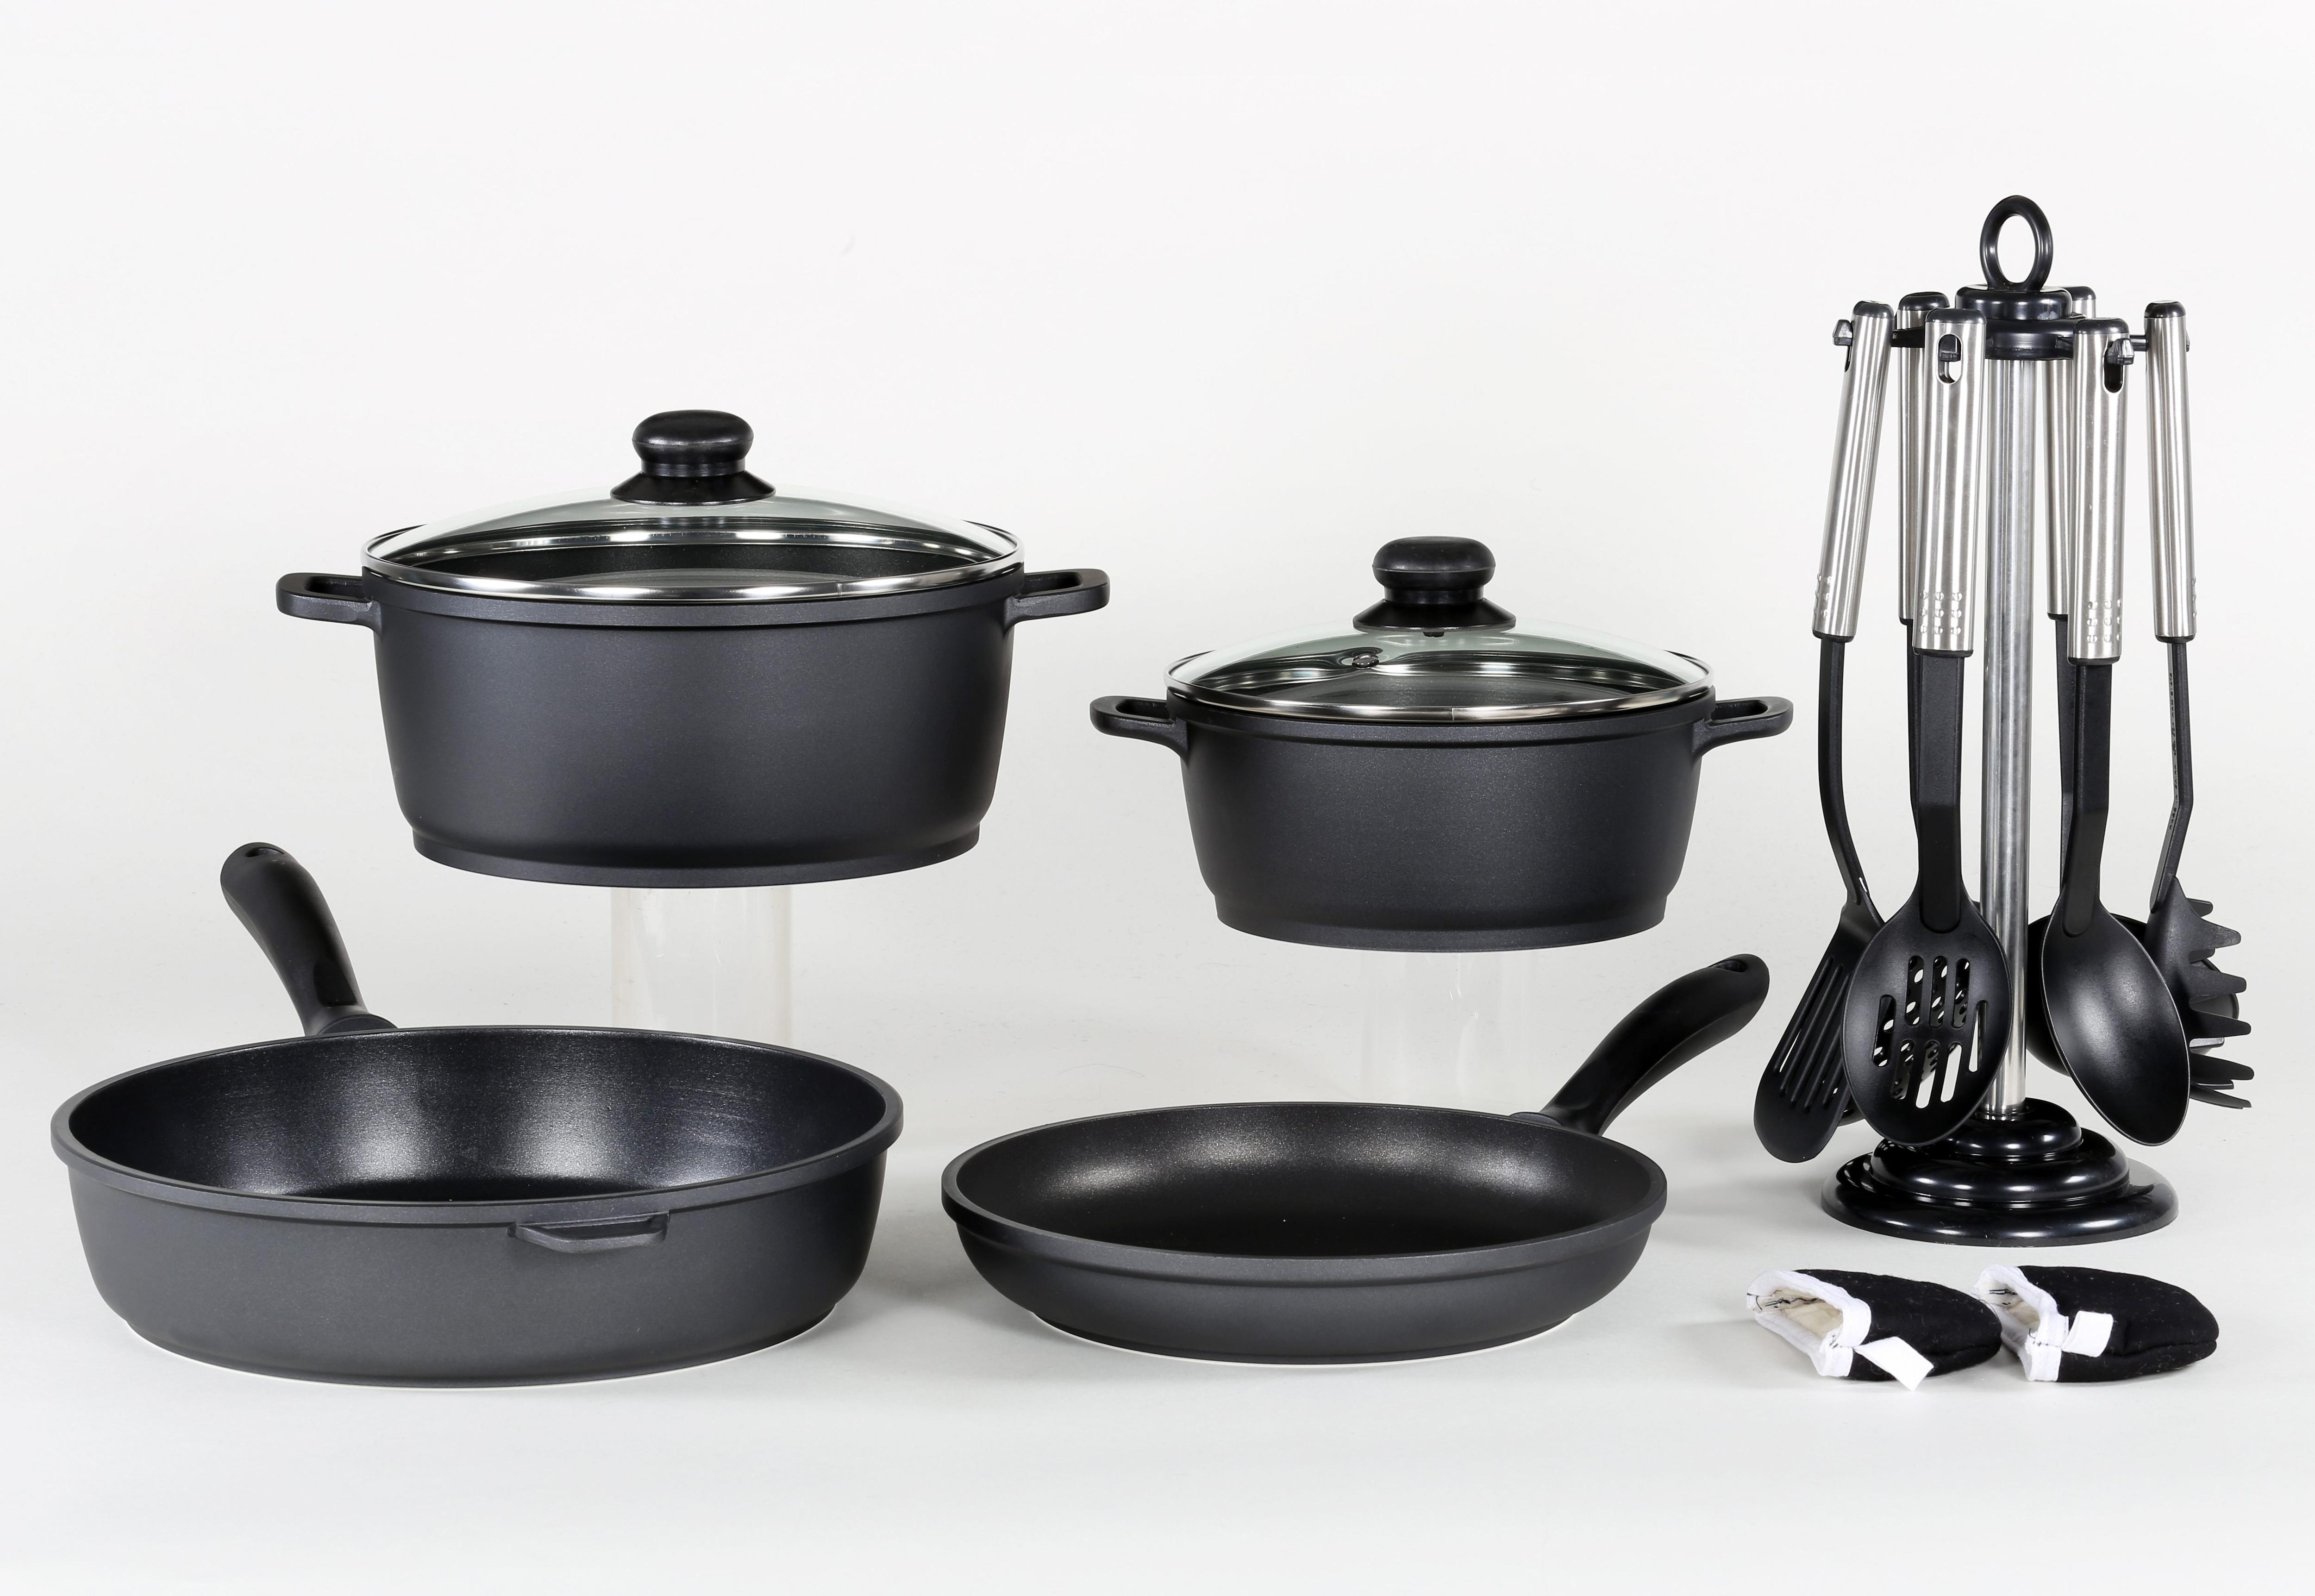 Krüger Pfannen-Set, Aluminiumguss, (Set, 13 tlg.) schwarz Pfannen-Set Topfsets Töpfe Haushaltswaren